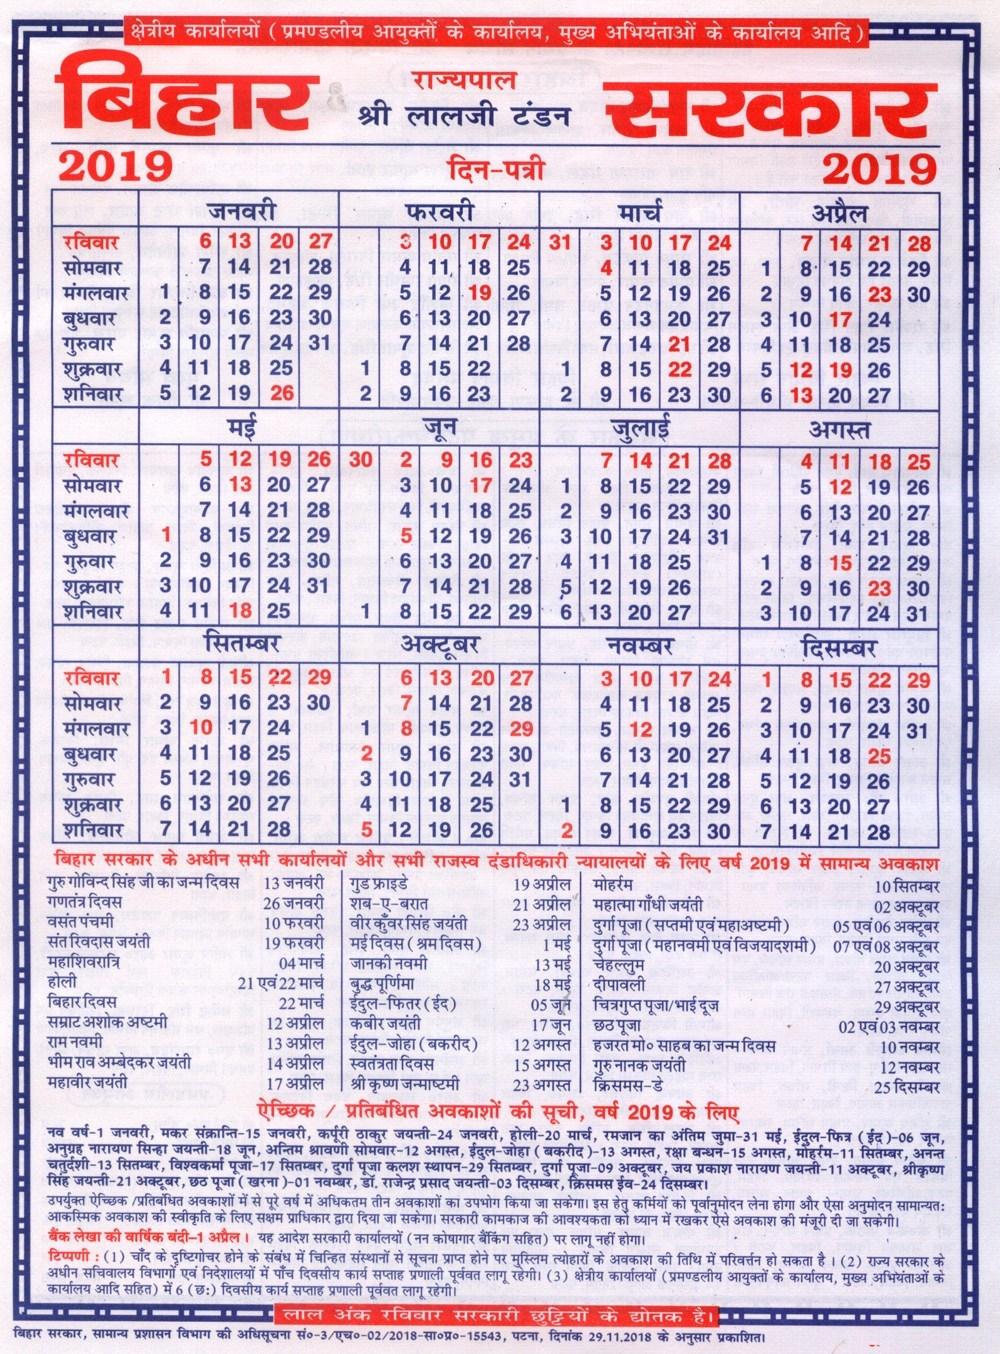 Bihar_Government_Calendar2019 | Bihar School throughout Bihar Sarkar Calendra 2020